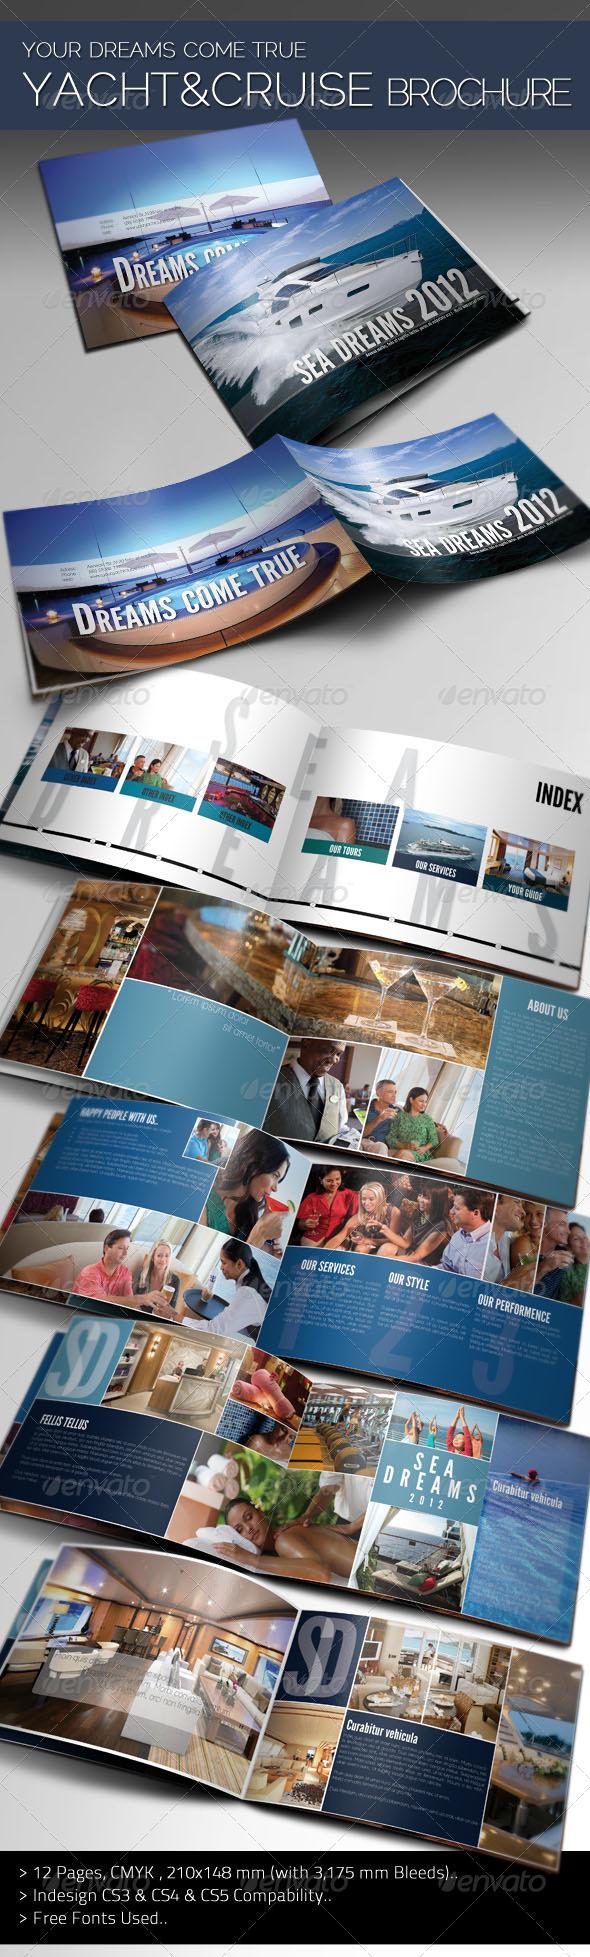 cruise ship brochure templates - sea dreams yacht cruise brochure graphicriver